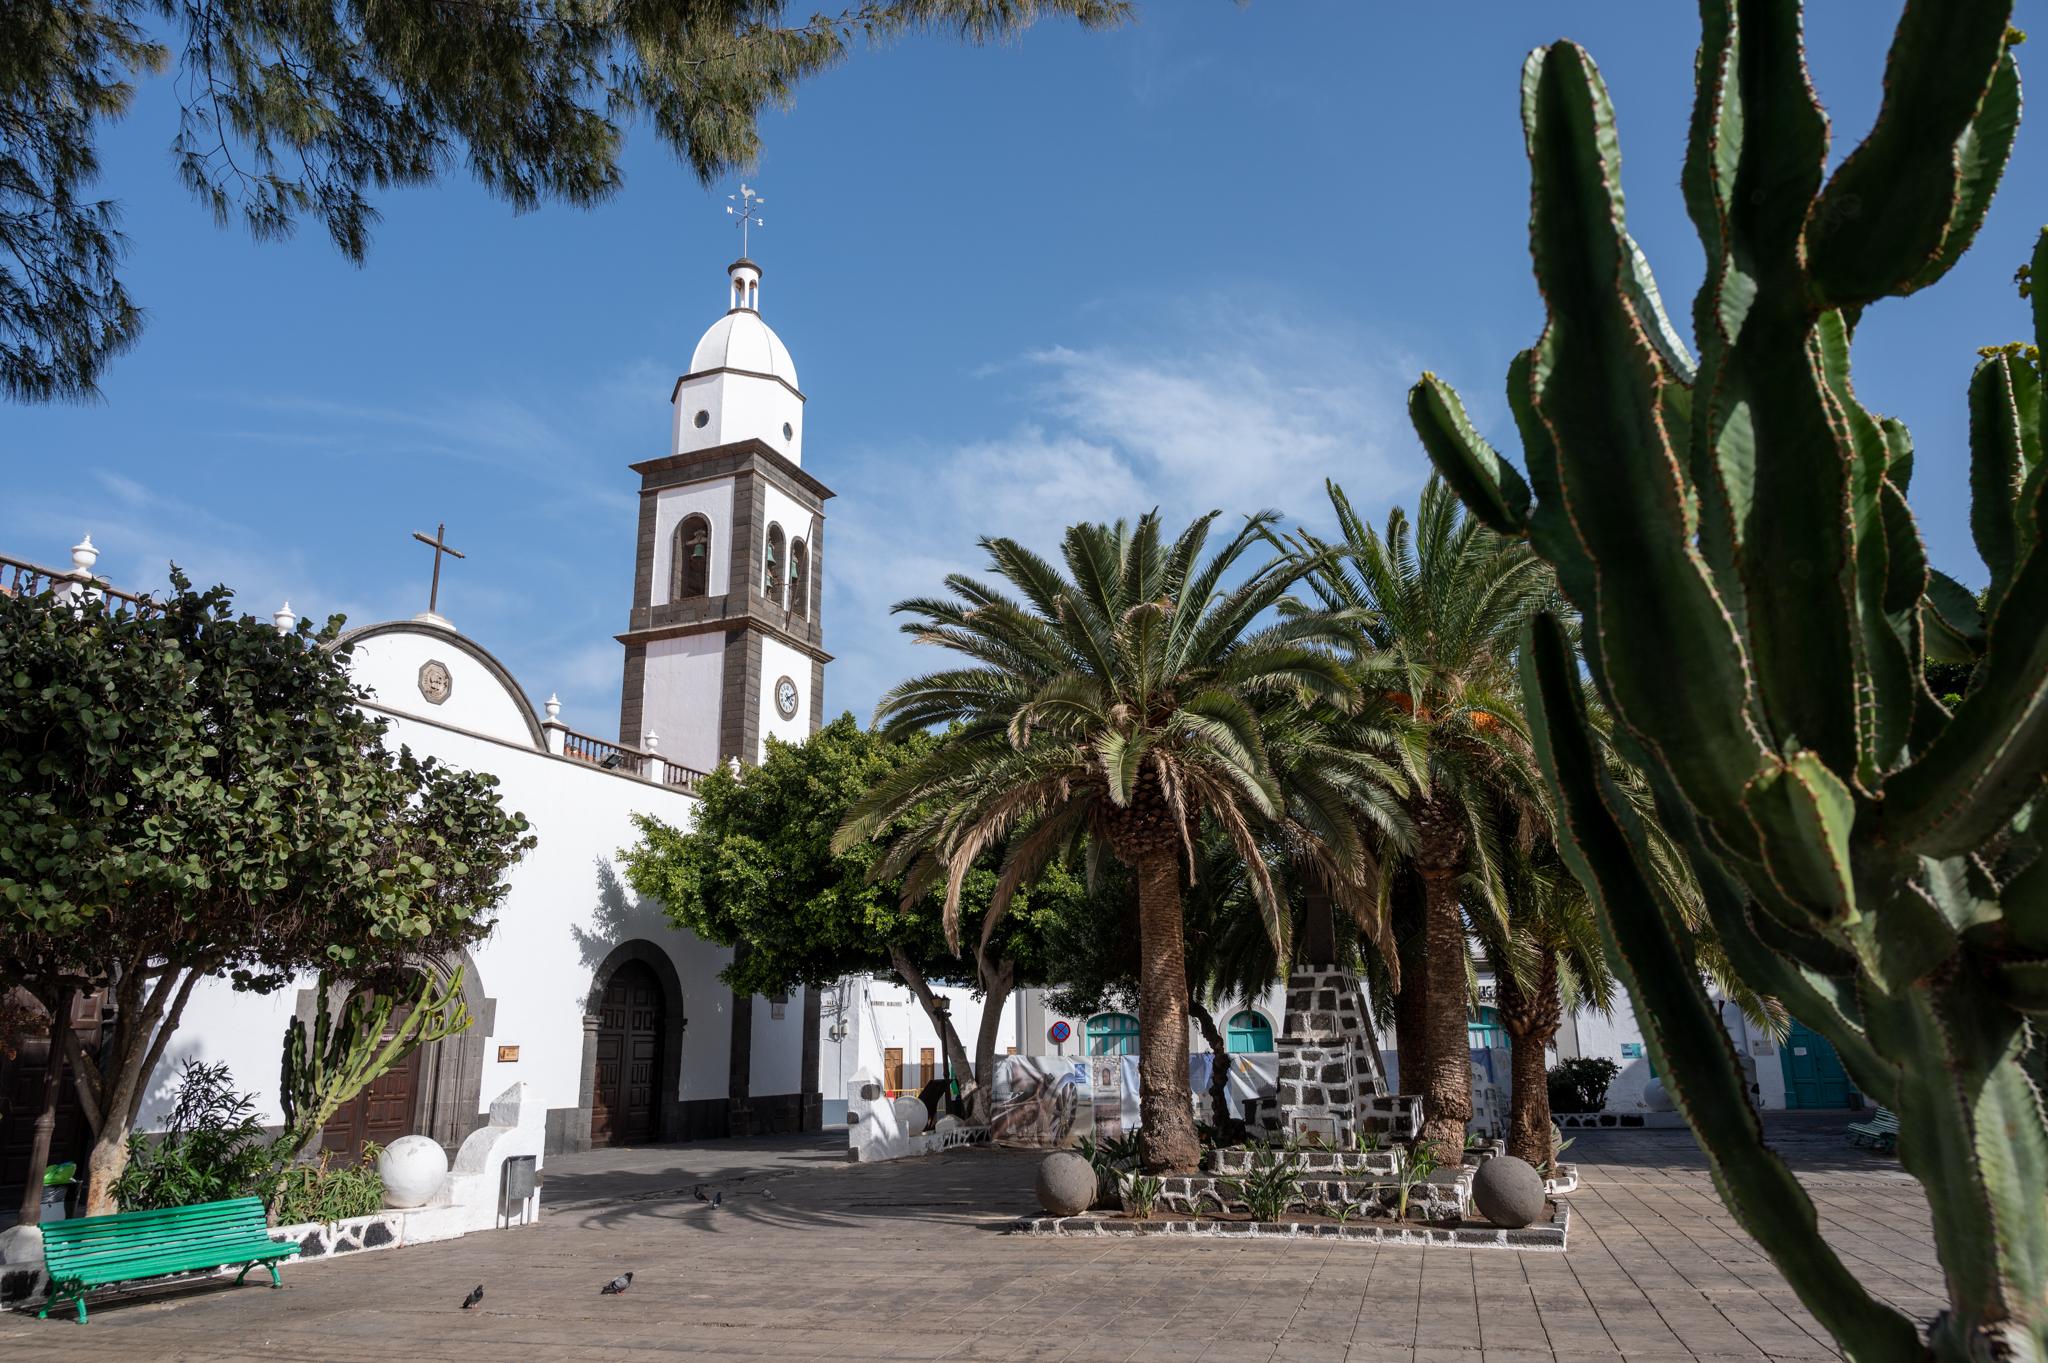 Iglesia de San Gines in Arrecife auf Lanzarote